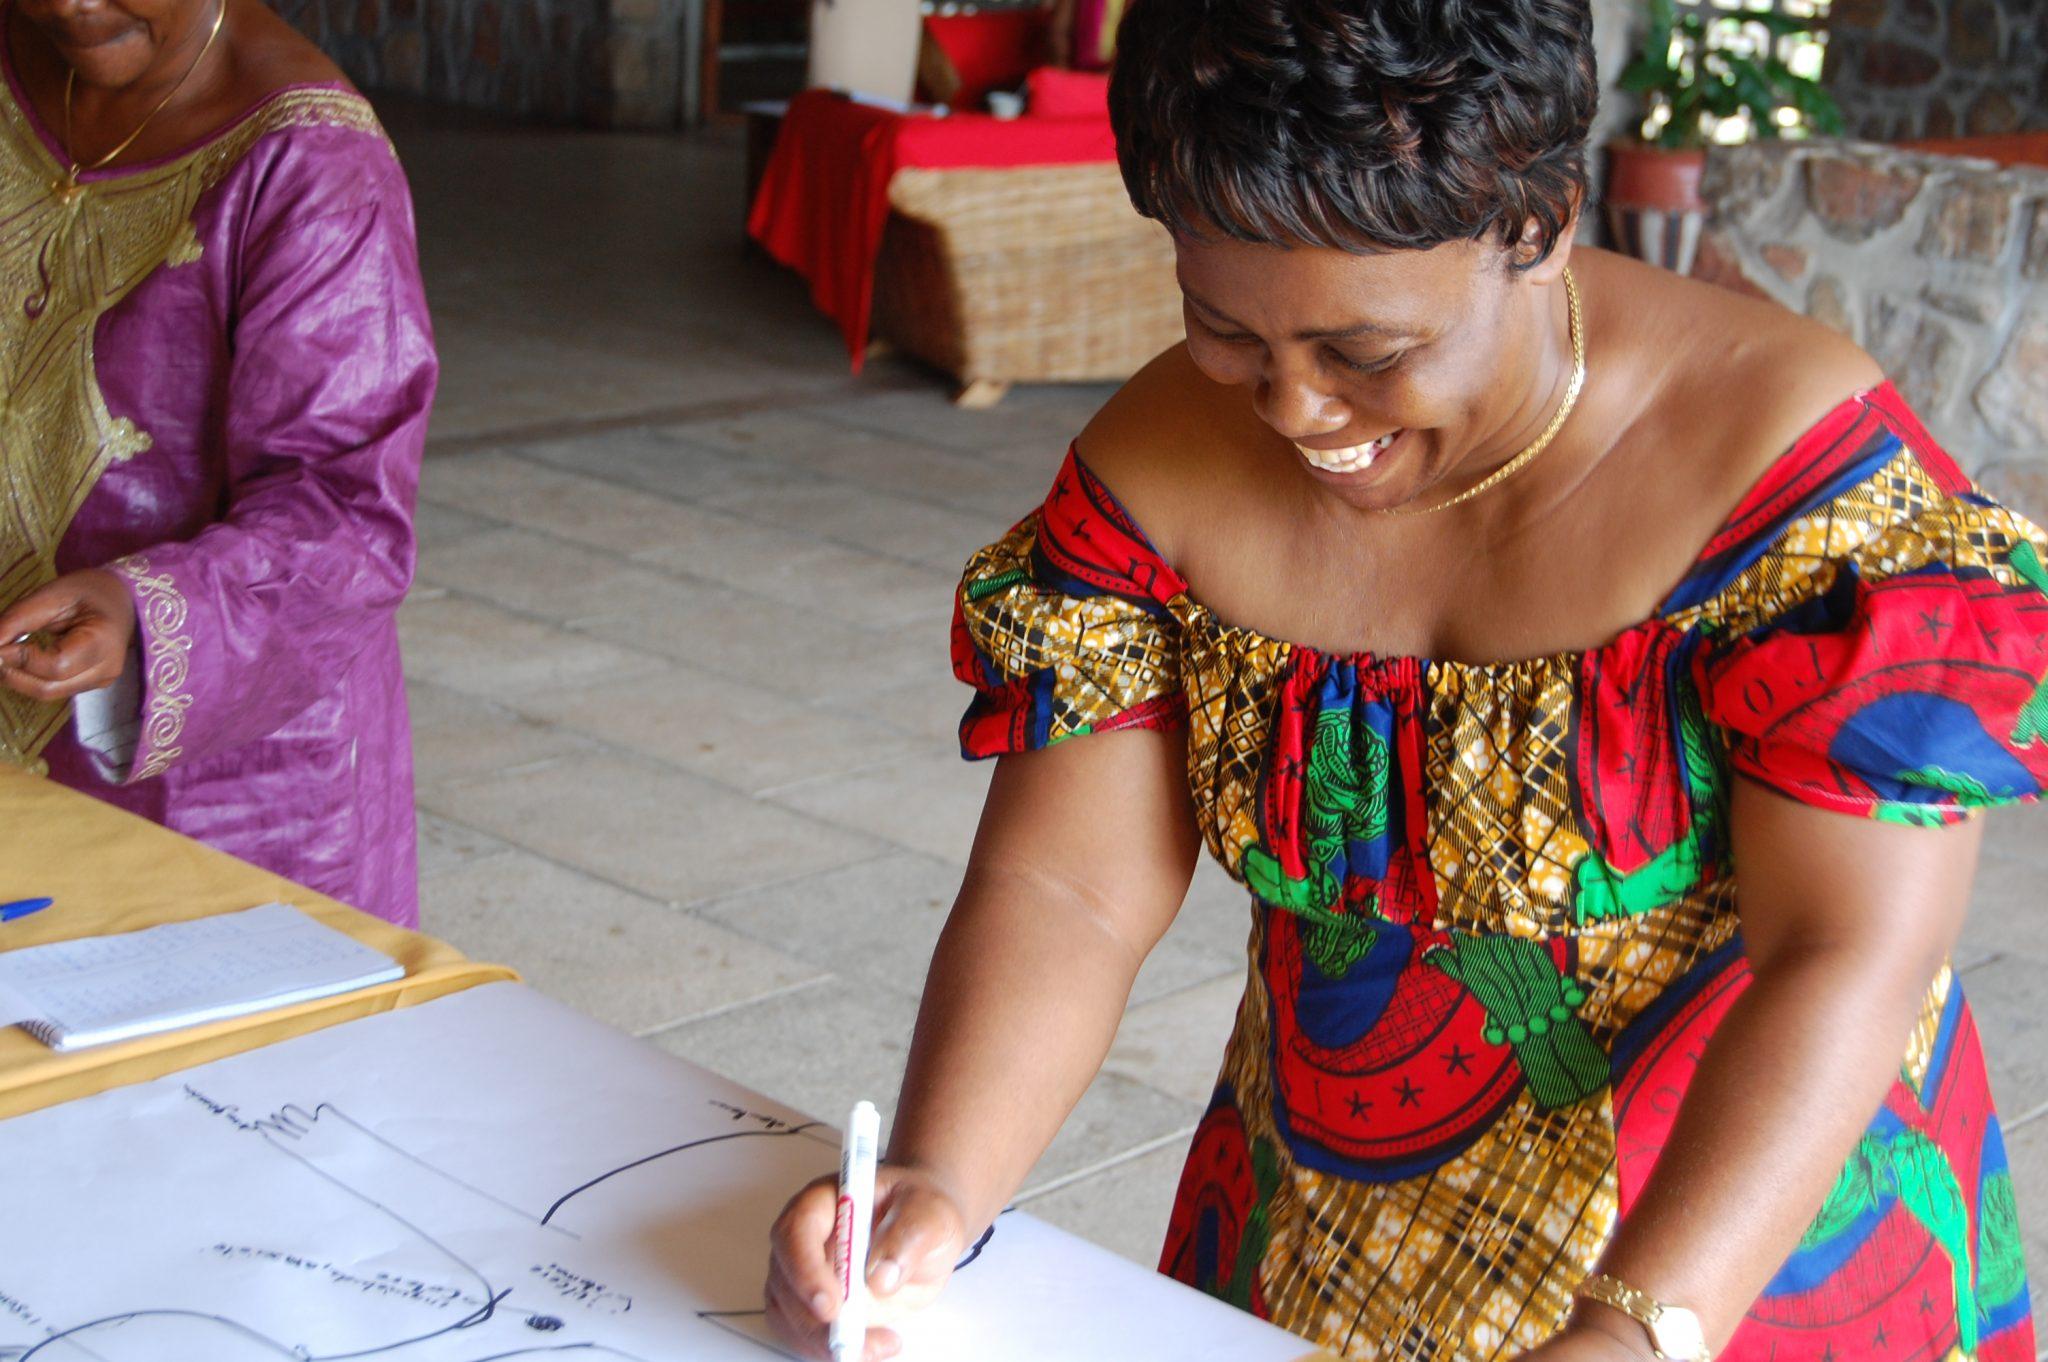 Photo: Congolese women's rights activist Julienne Lusange participates in a workshop on integrated security, organised by the Kvinna till Kvinna Foundation. Photo: Anna Lithander / Kvinna till Kvinna